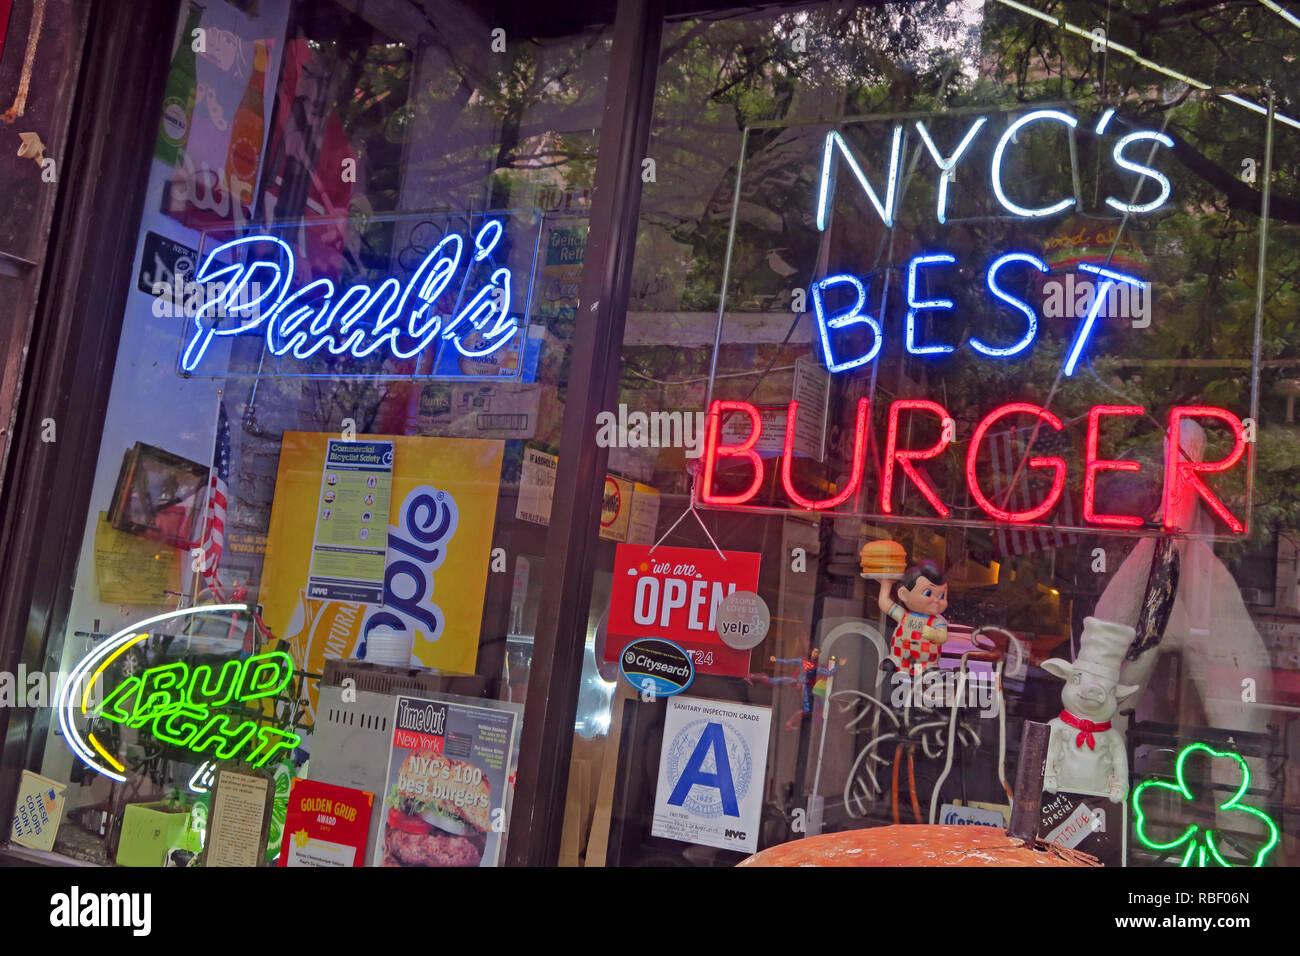 GoTonySmith,@HotpixUK,HotpixUK,NOHO NYC,NYC,New York City,St Marks Place NYC,New York St Marks Place,street,New York Street,USA,America,City Centre,city,centre,center,city center,East Village,Eastvillage,New York Travel Tourism,NYC Best Burger,Best Burger,sign,neon,Beef,Beefburger,Beef Burger,patty,cafe,restaurant,diner,Manhattan,NY,beef,red white blue,shopfront,window,sign in window